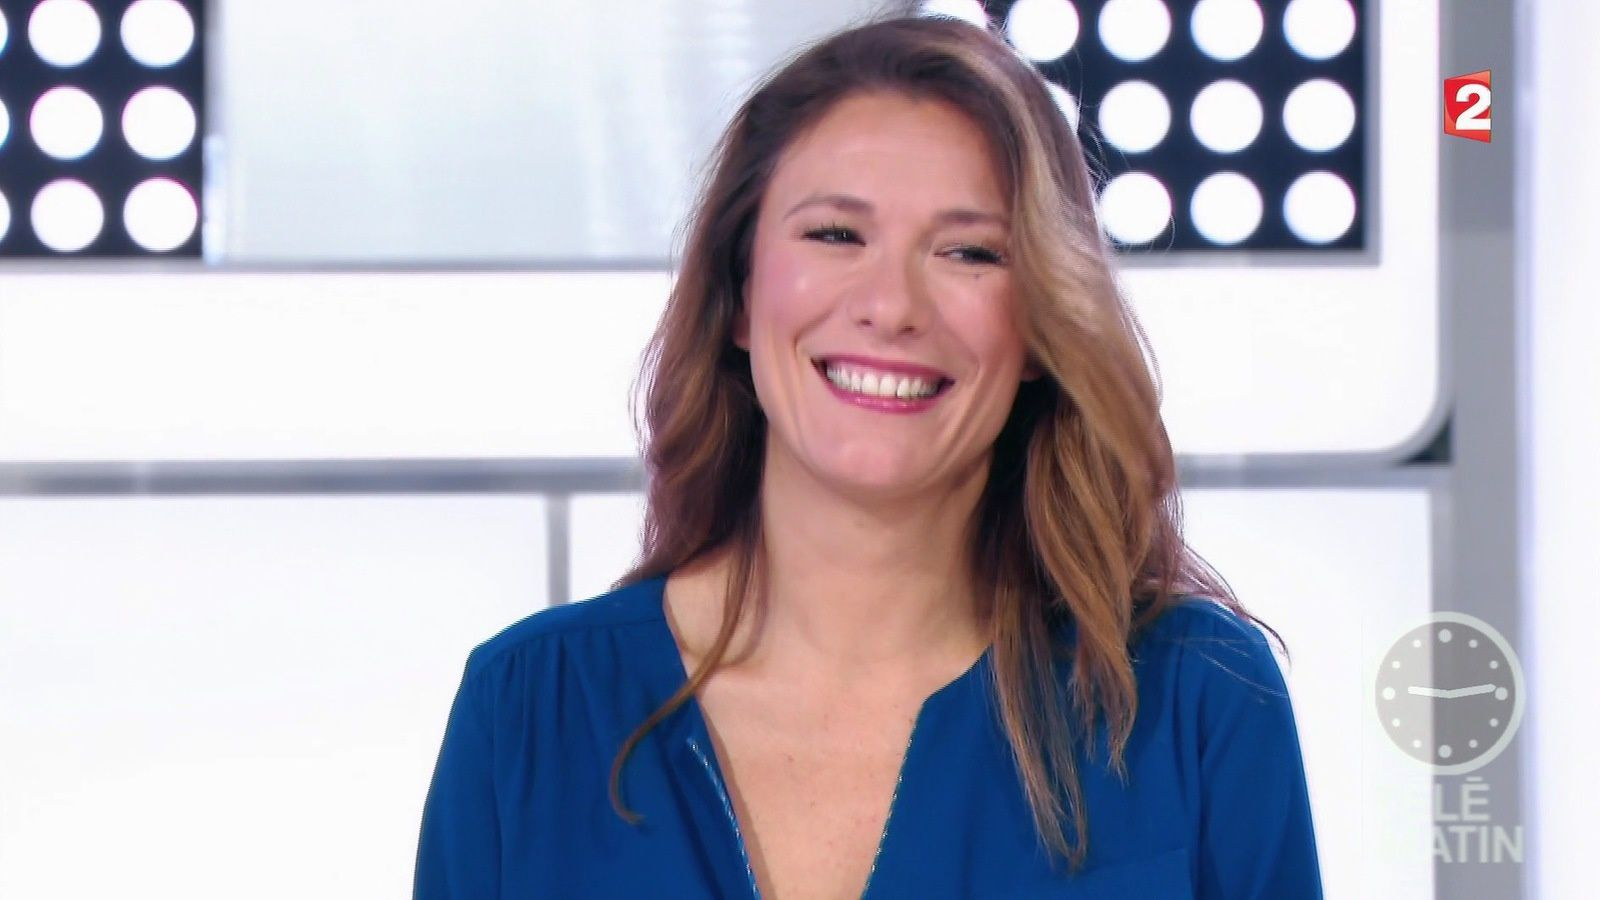 📸9 MARIE MAMGIOGLOU @MarieMamgioglou @telematin @France2tv ce matin #vuesalatele